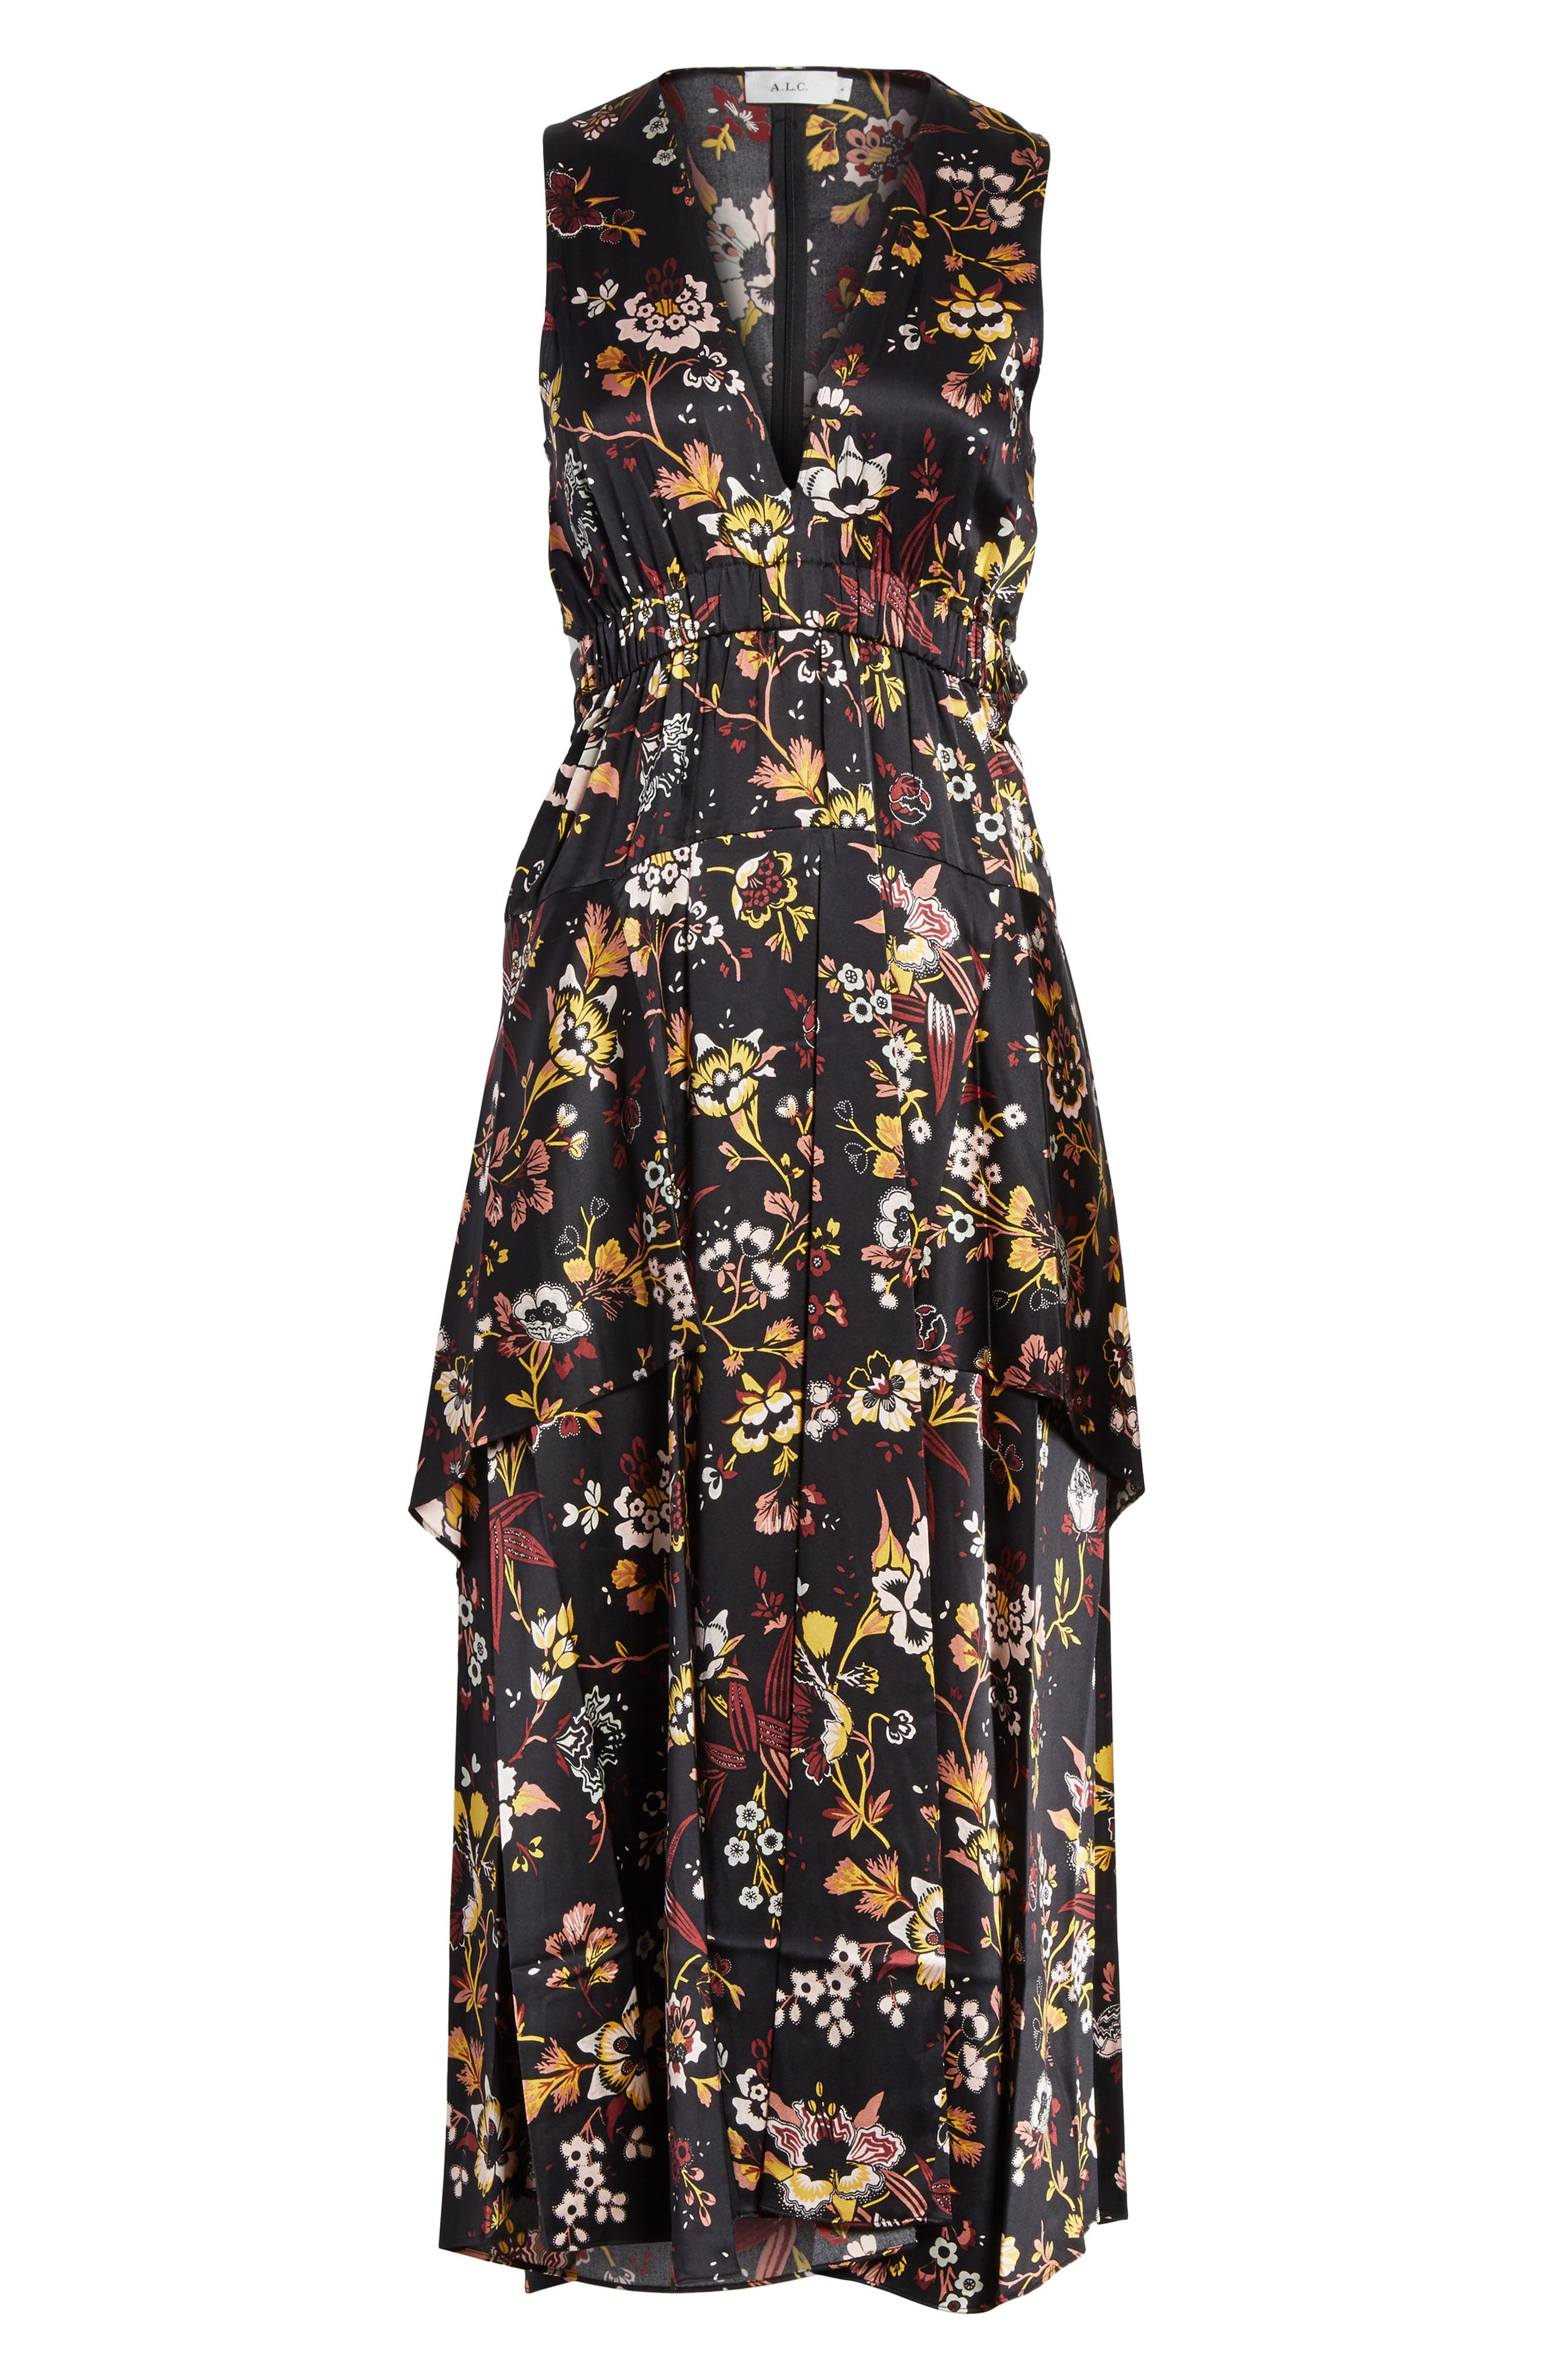 Verbena Floral Print Stretch Silk Dress,                             Alternate thumbnail 6, color,                             002